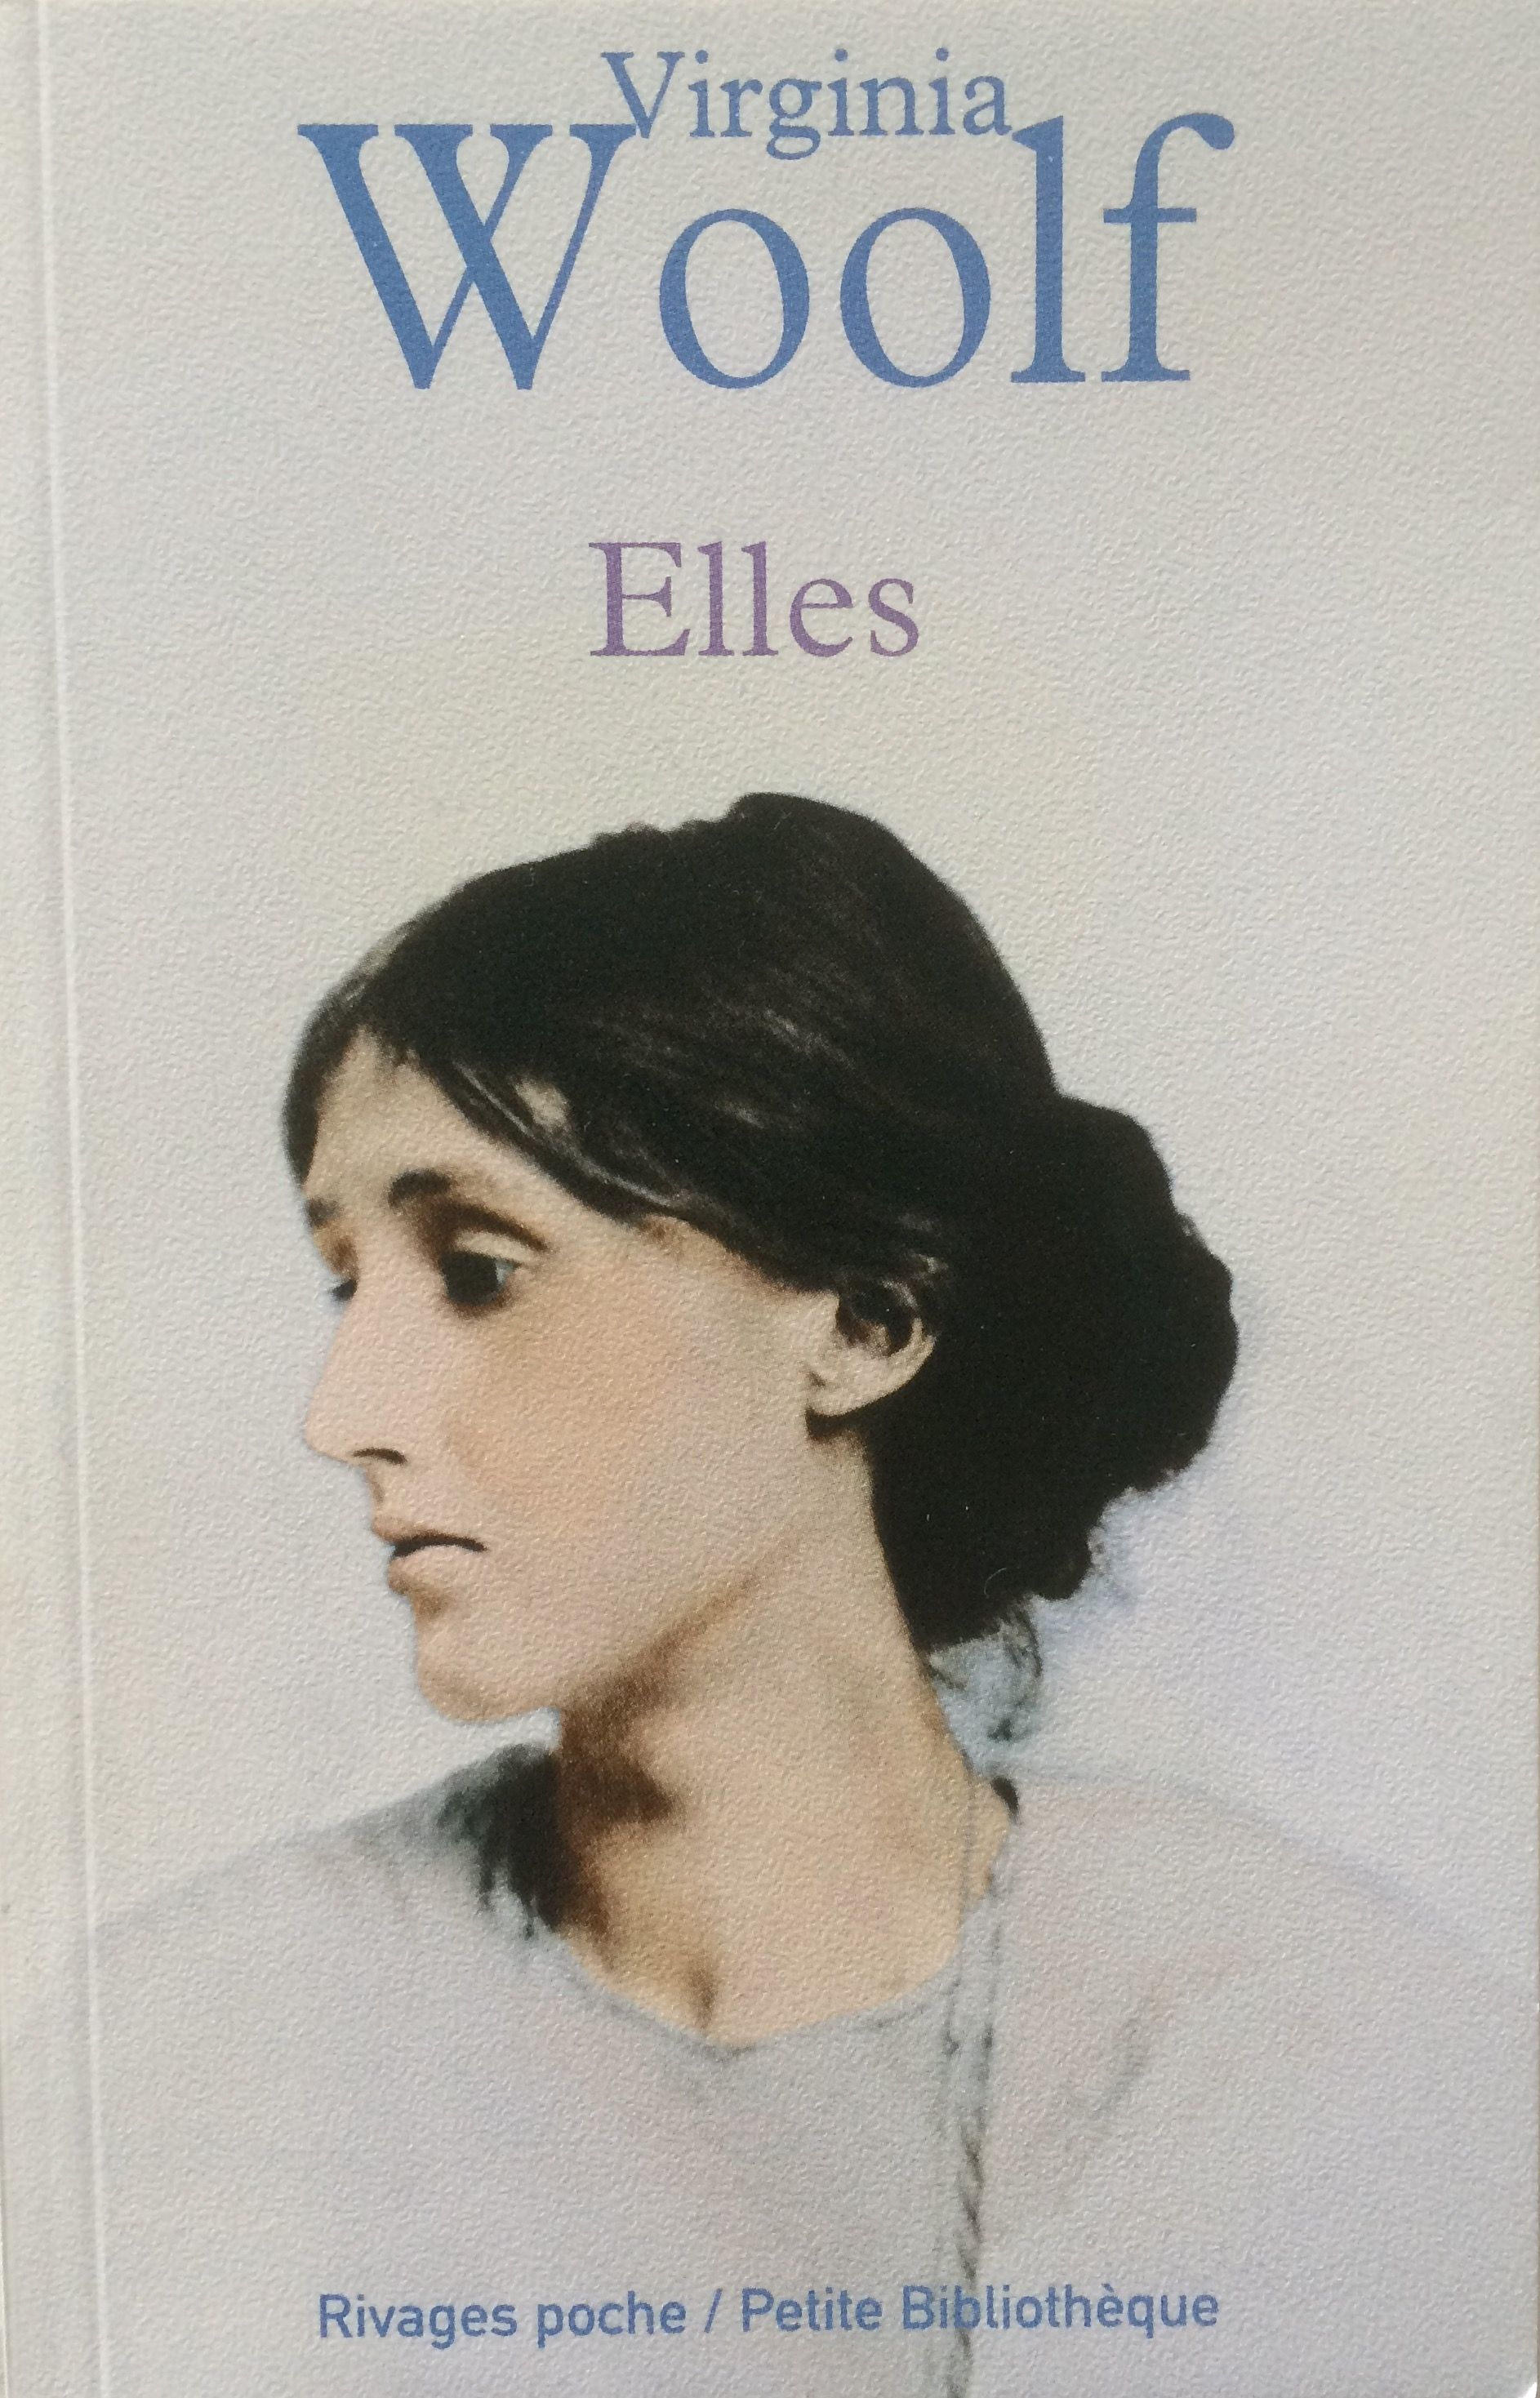 Épinglé sur Virginia Woolf